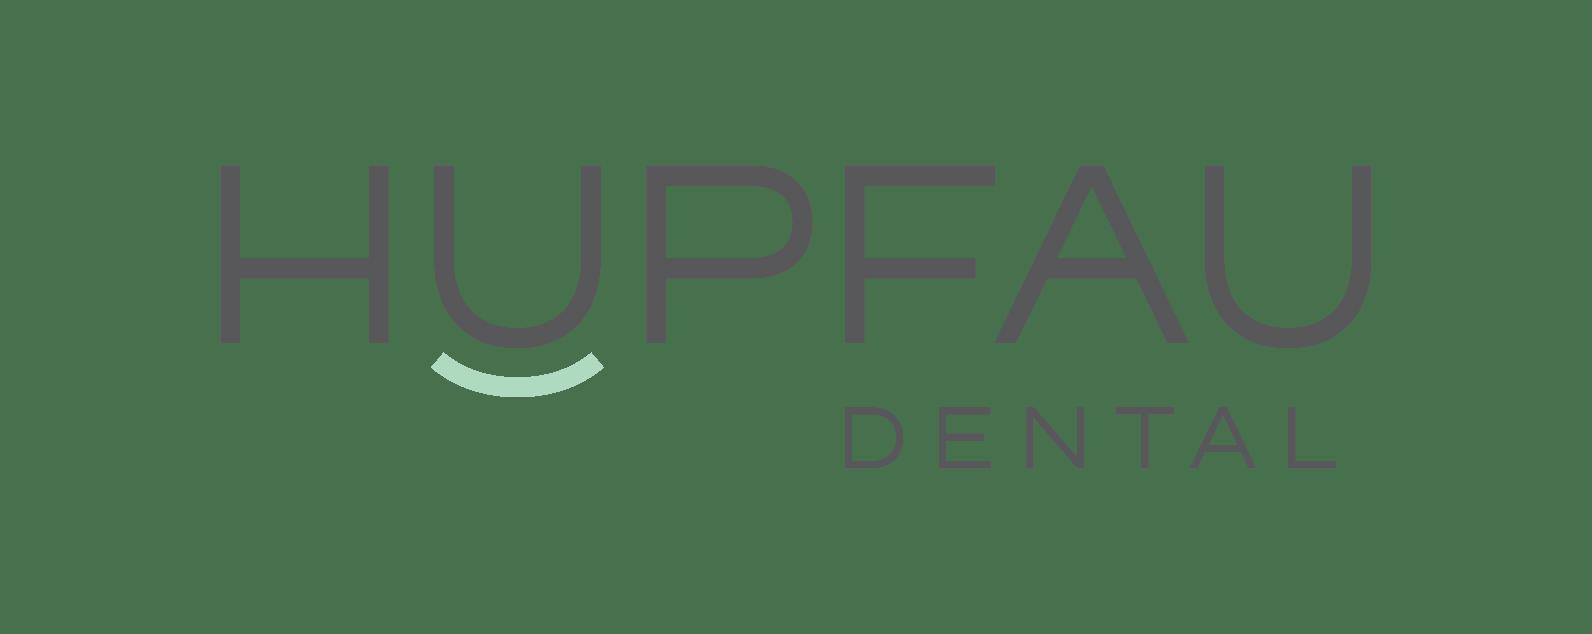 Y5 Creative Case Studies Logo Hupfau Dental